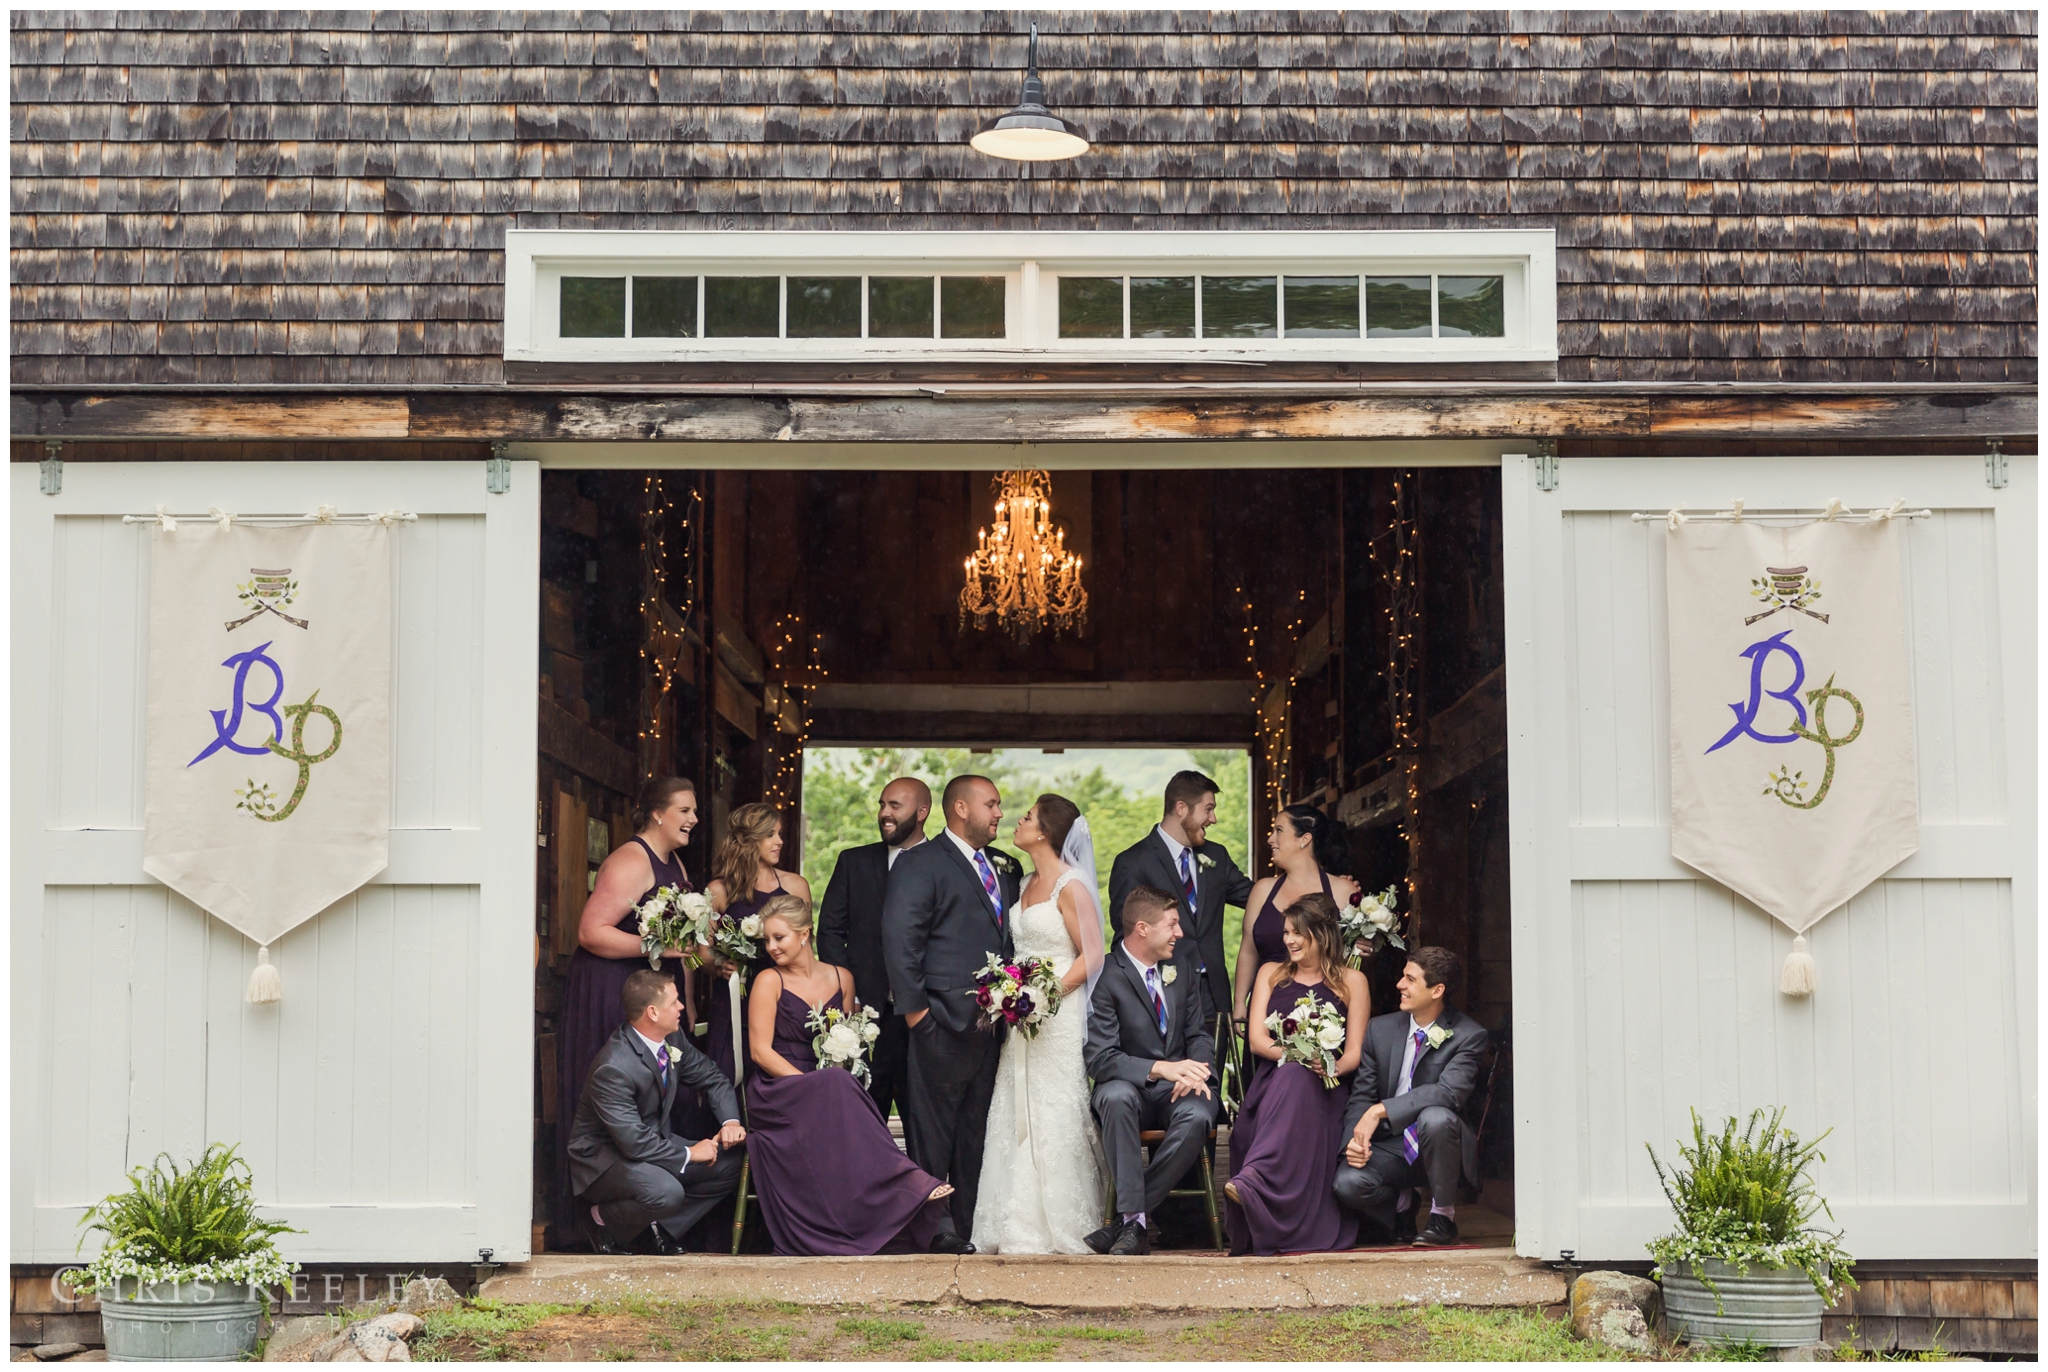 burrows-new-hampshire-wedding-04.jpg